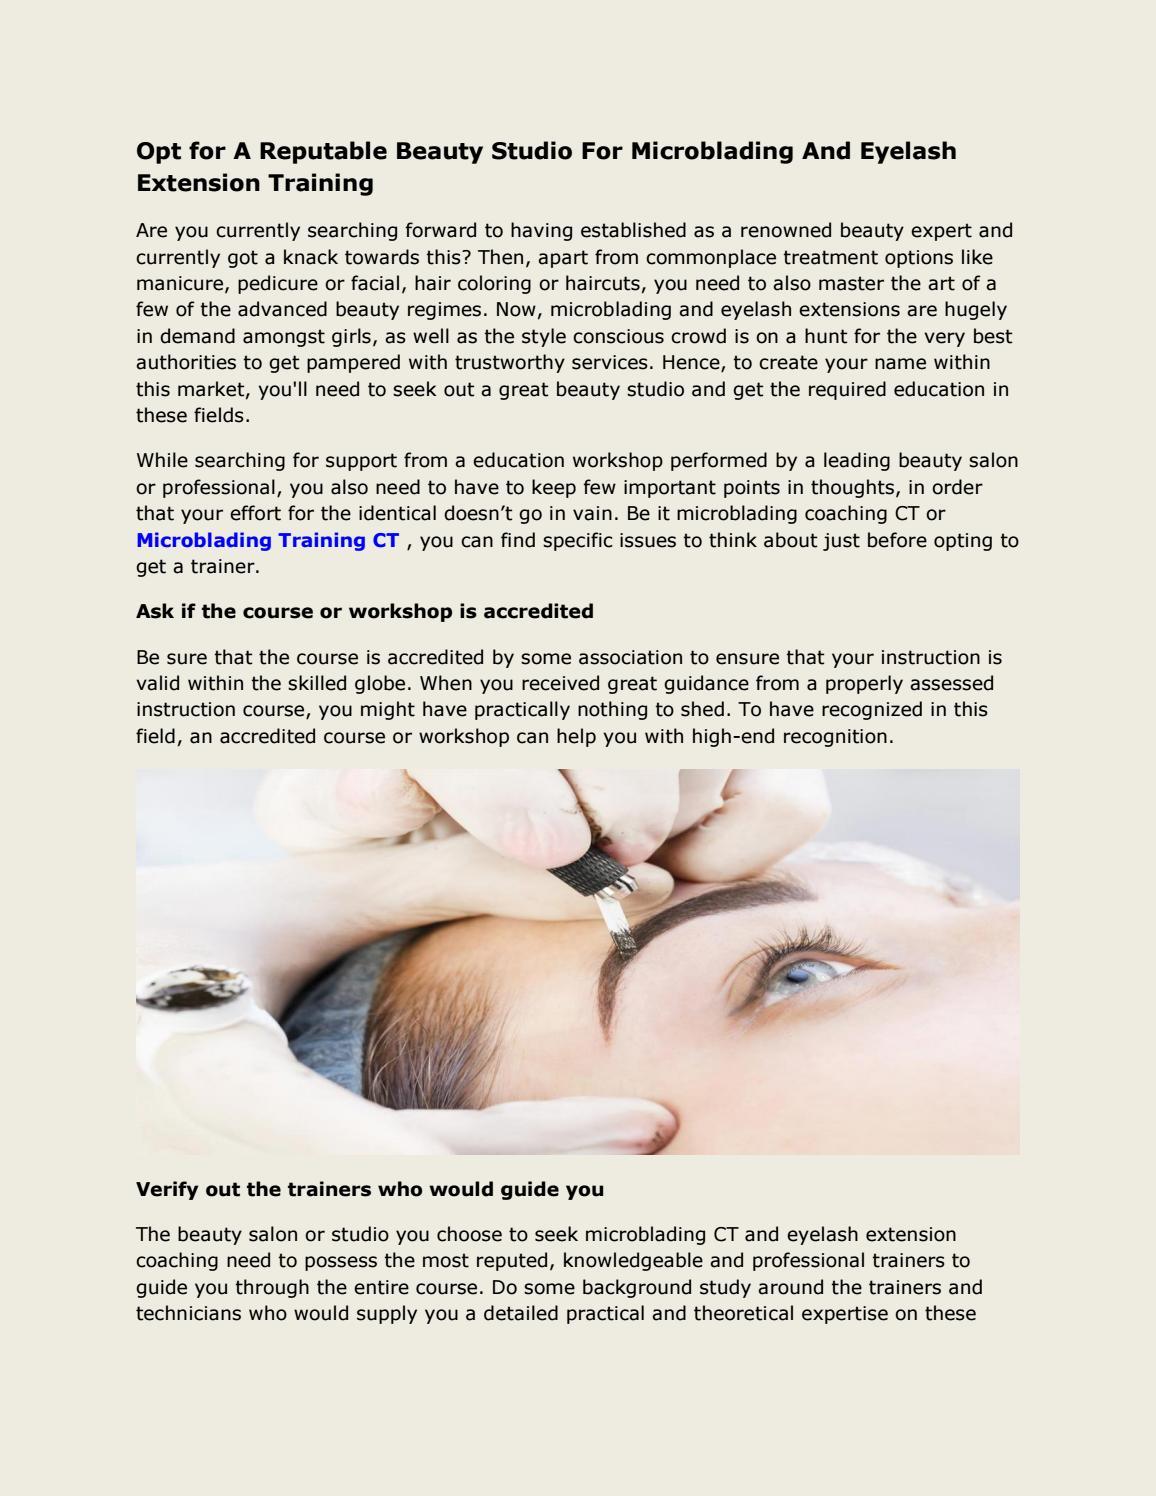 Eyelash extensions training ct by Microblading Training CT ...